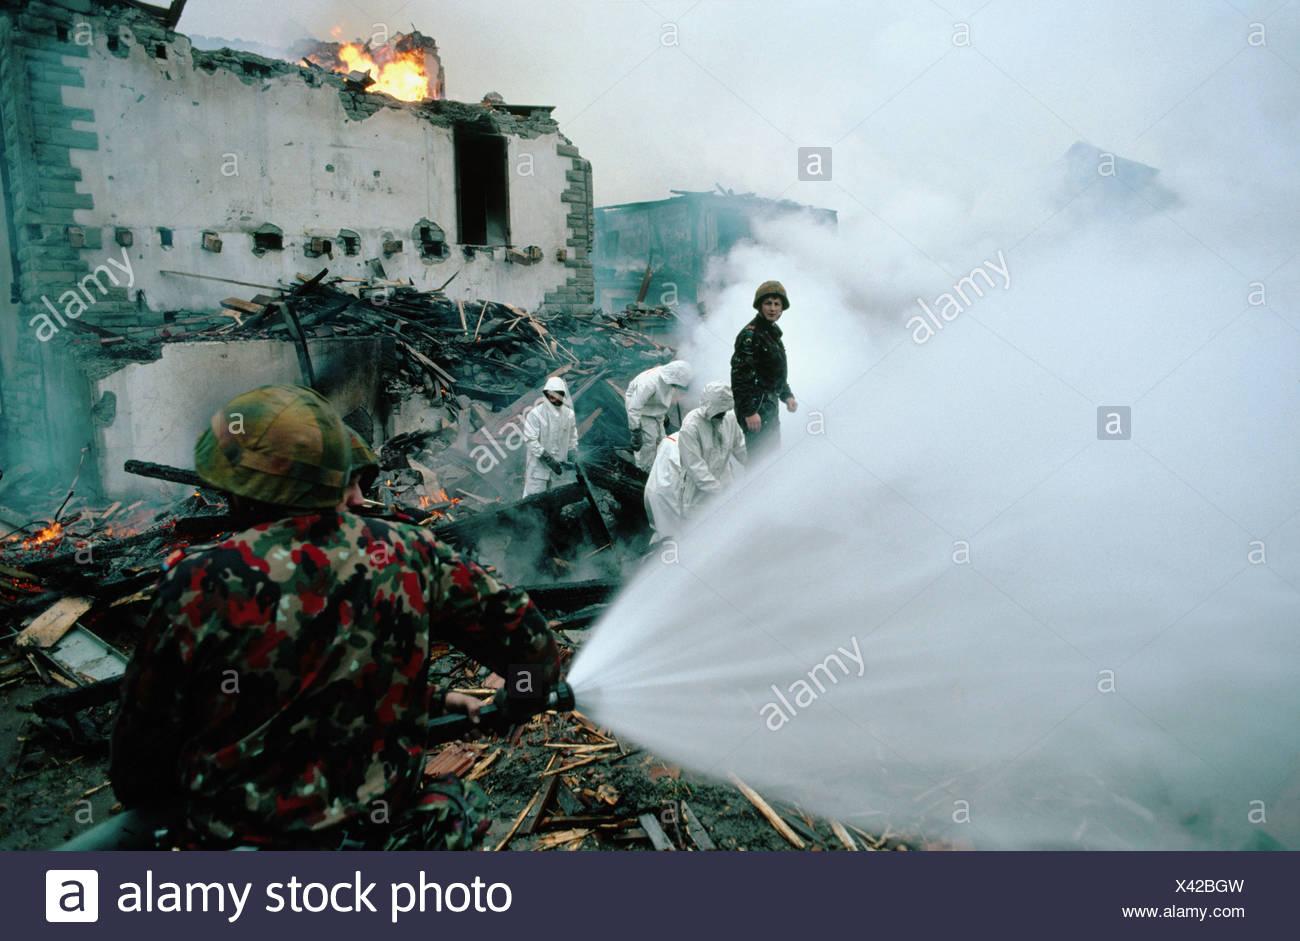 burn house home extinguishing fire brigade department fire-fighting work military Switzerland Europe pract - Stock Image